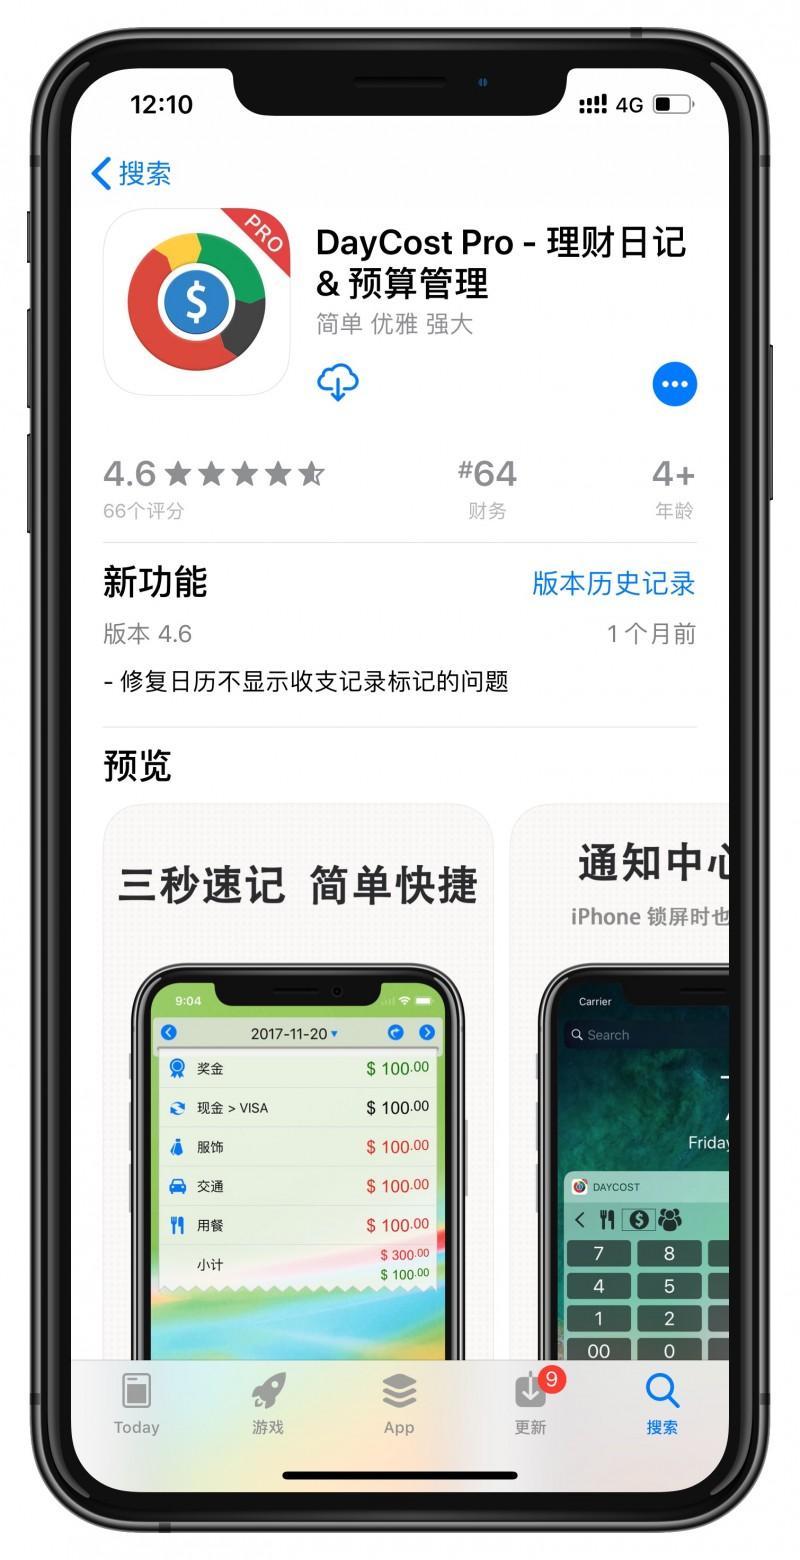 DayCost Pro – 理财日记 & 预算管理